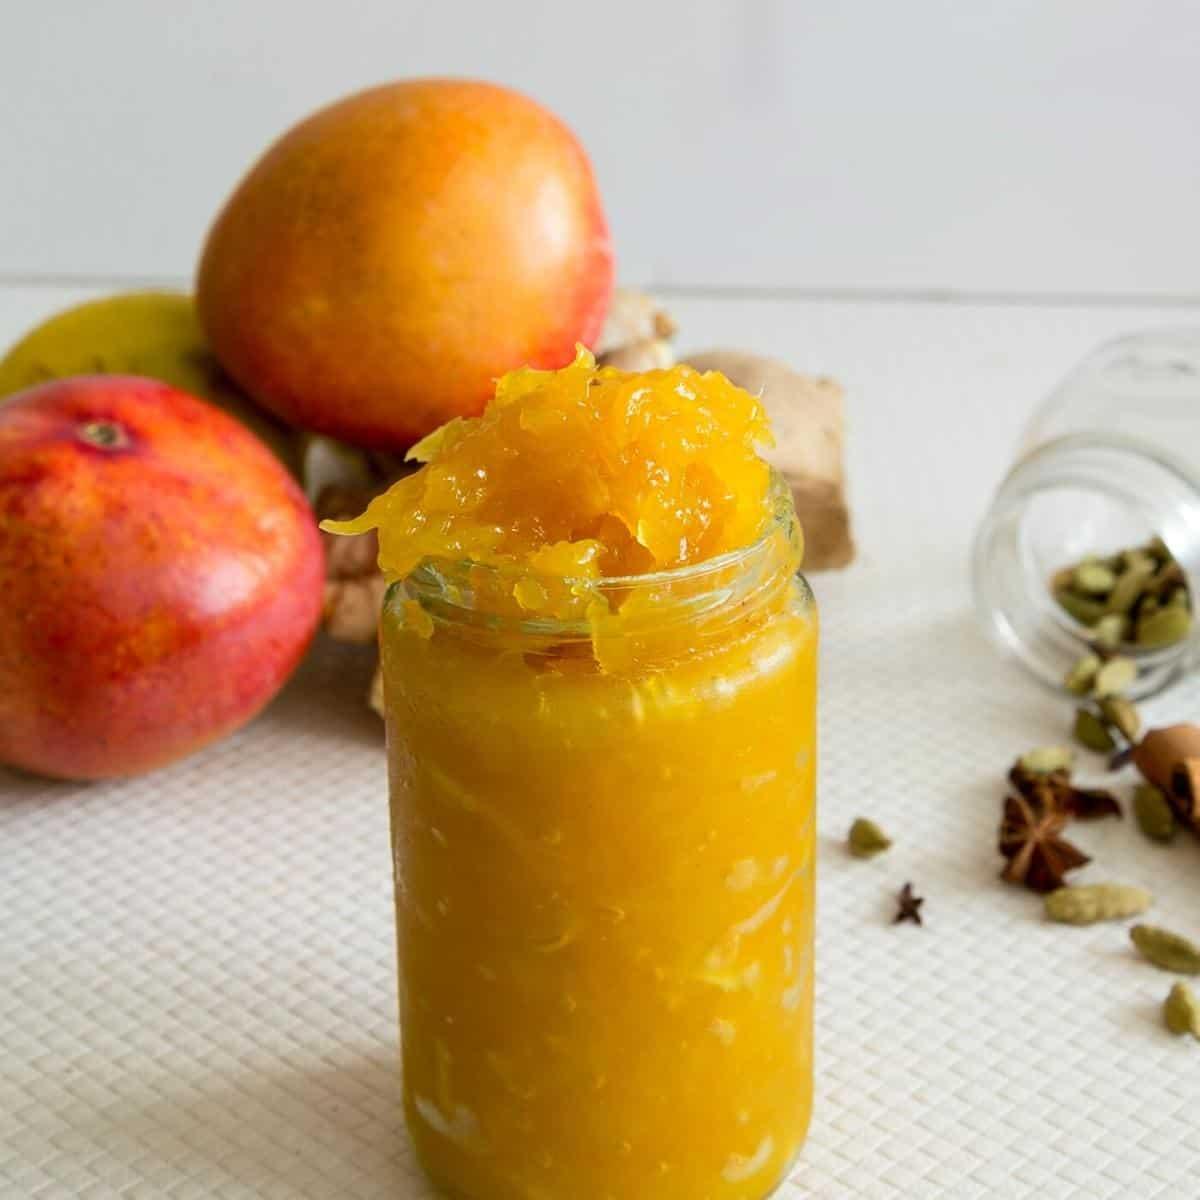 A mason jar with sweet mango chutney.